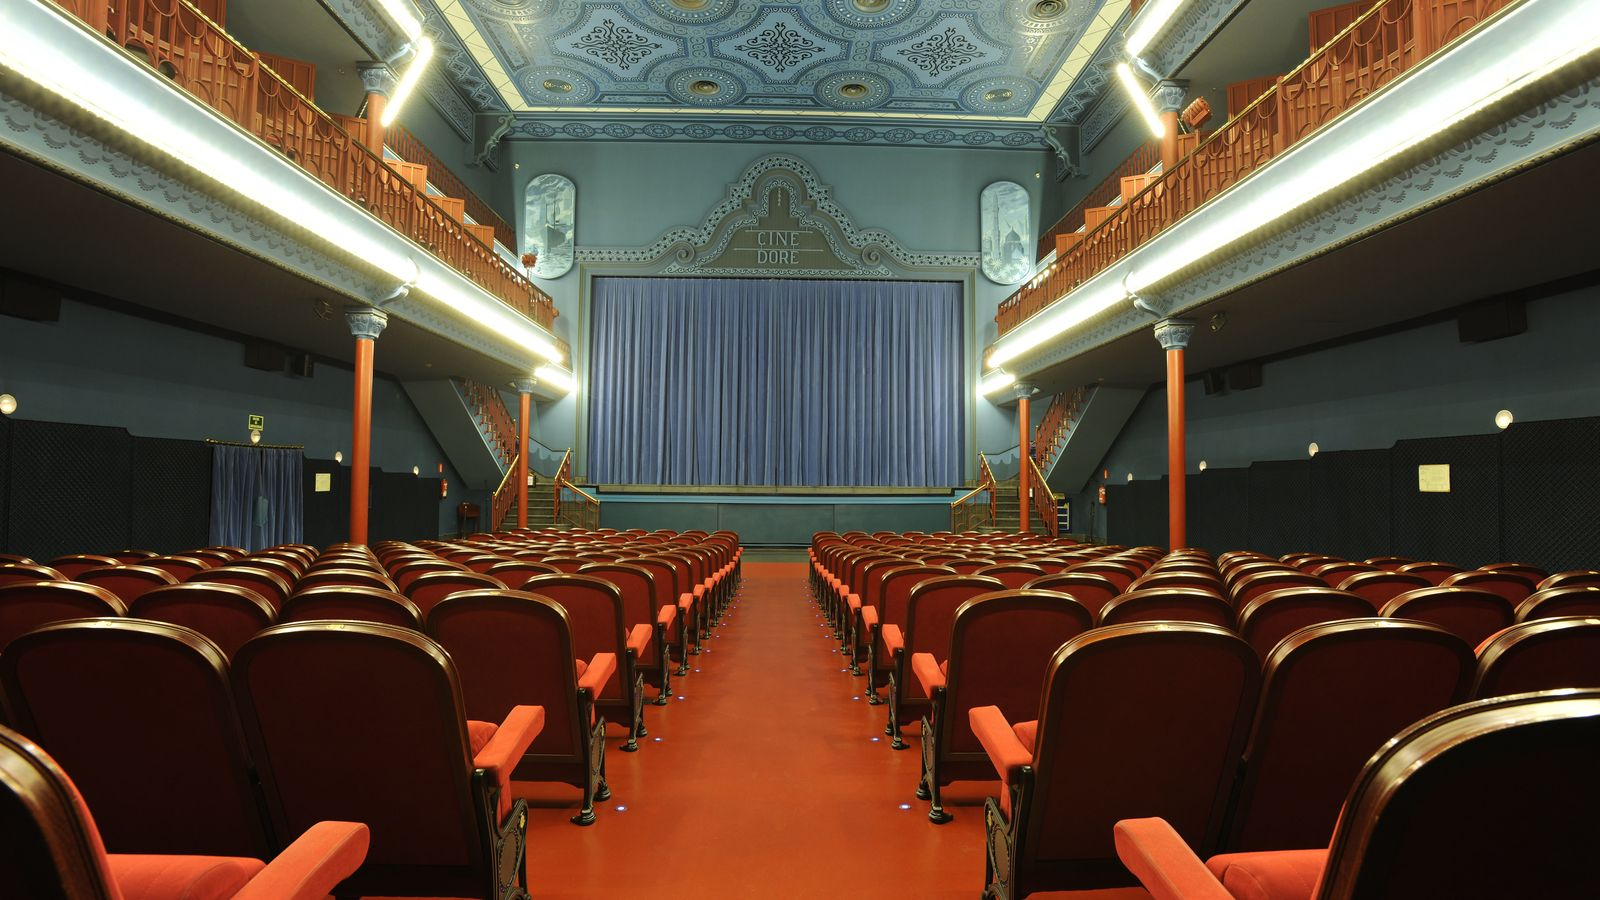 Foto: Sala 1 del Cine Doré